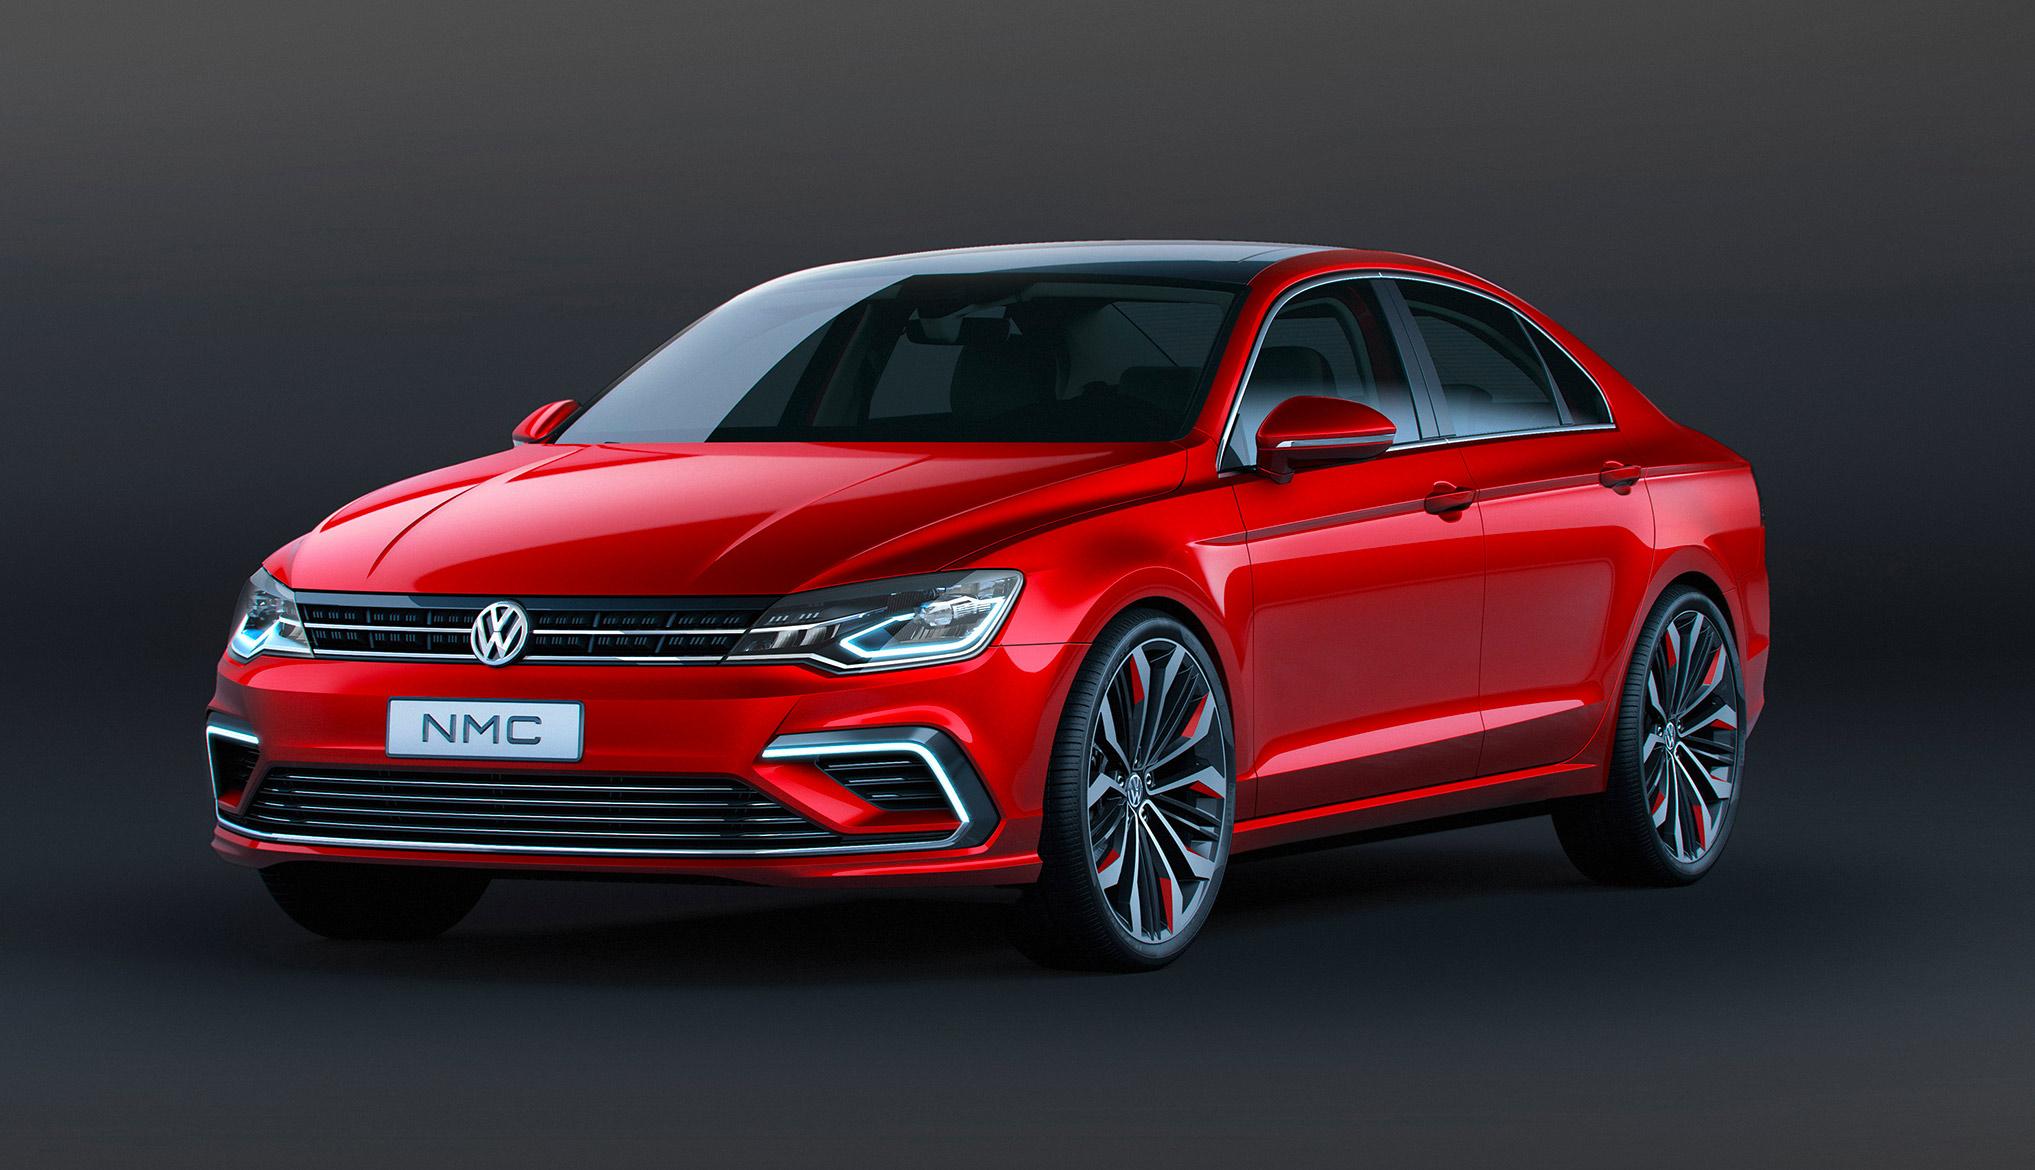 volkswagen-midsize-coupe-concept-11